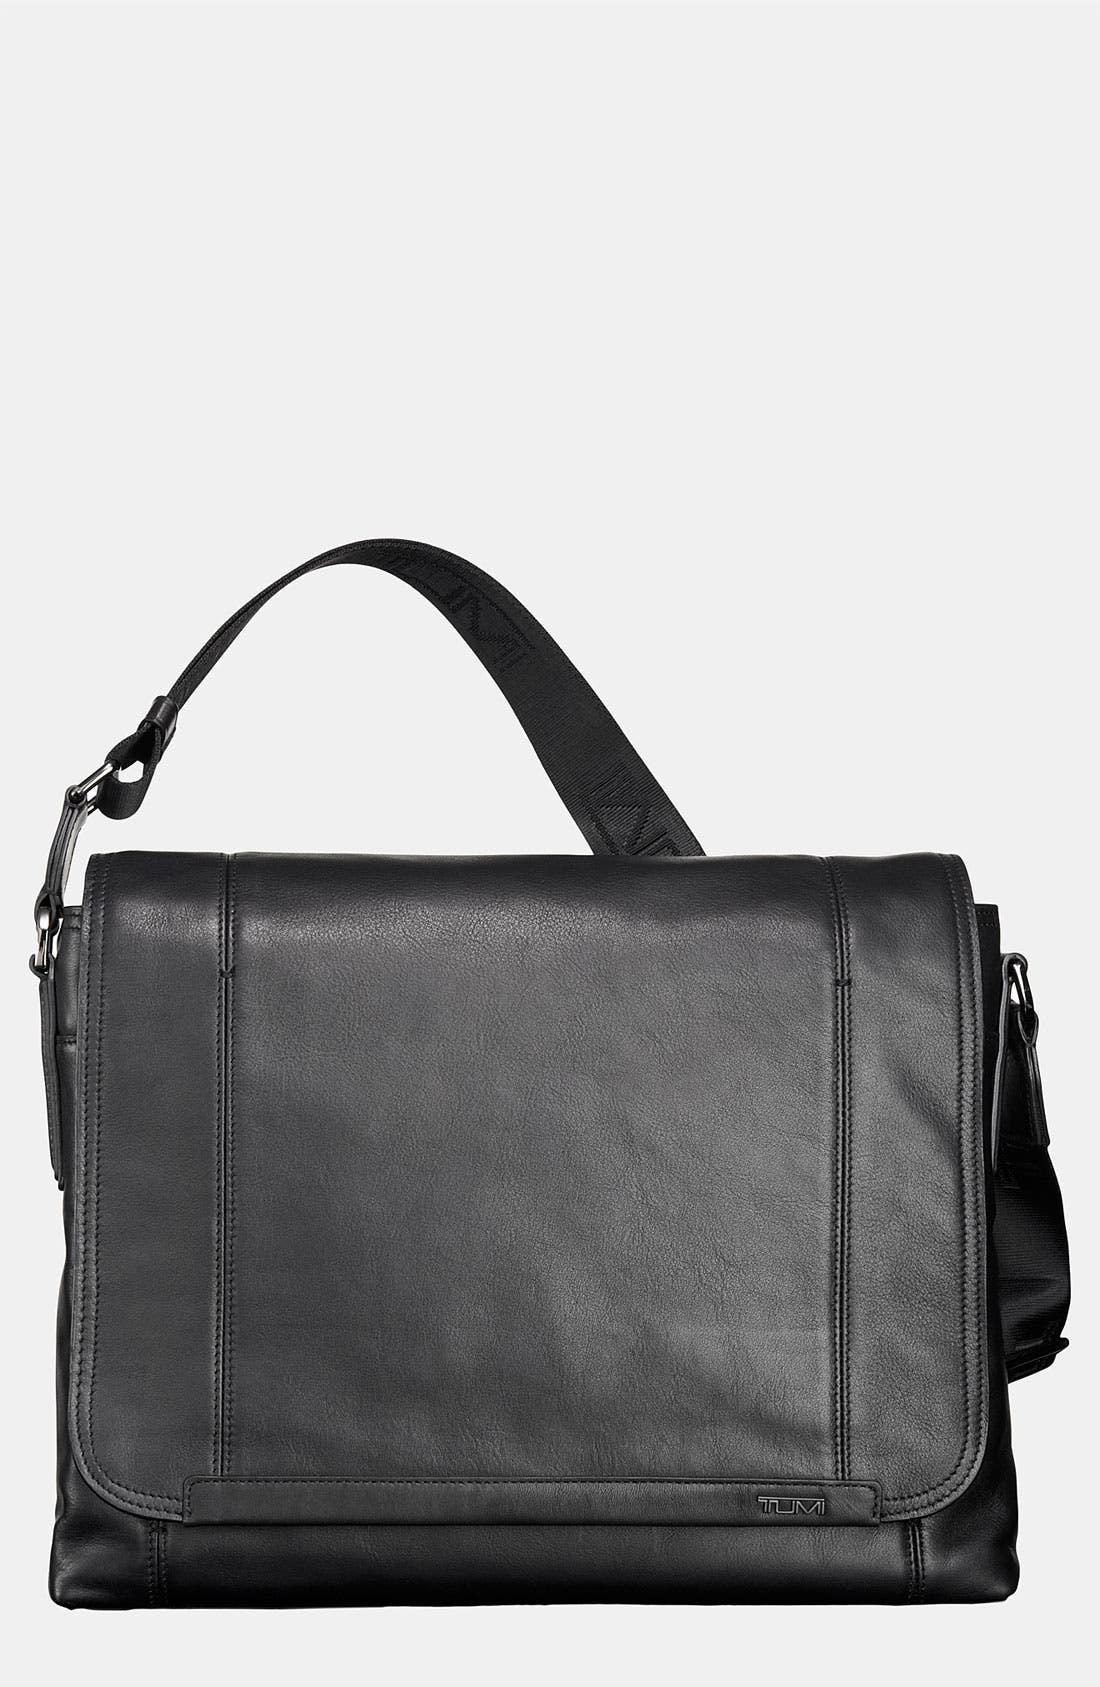 Alternate Image 1 Selected - Tumi 'Centro - Verona' Flap Messenger Bag